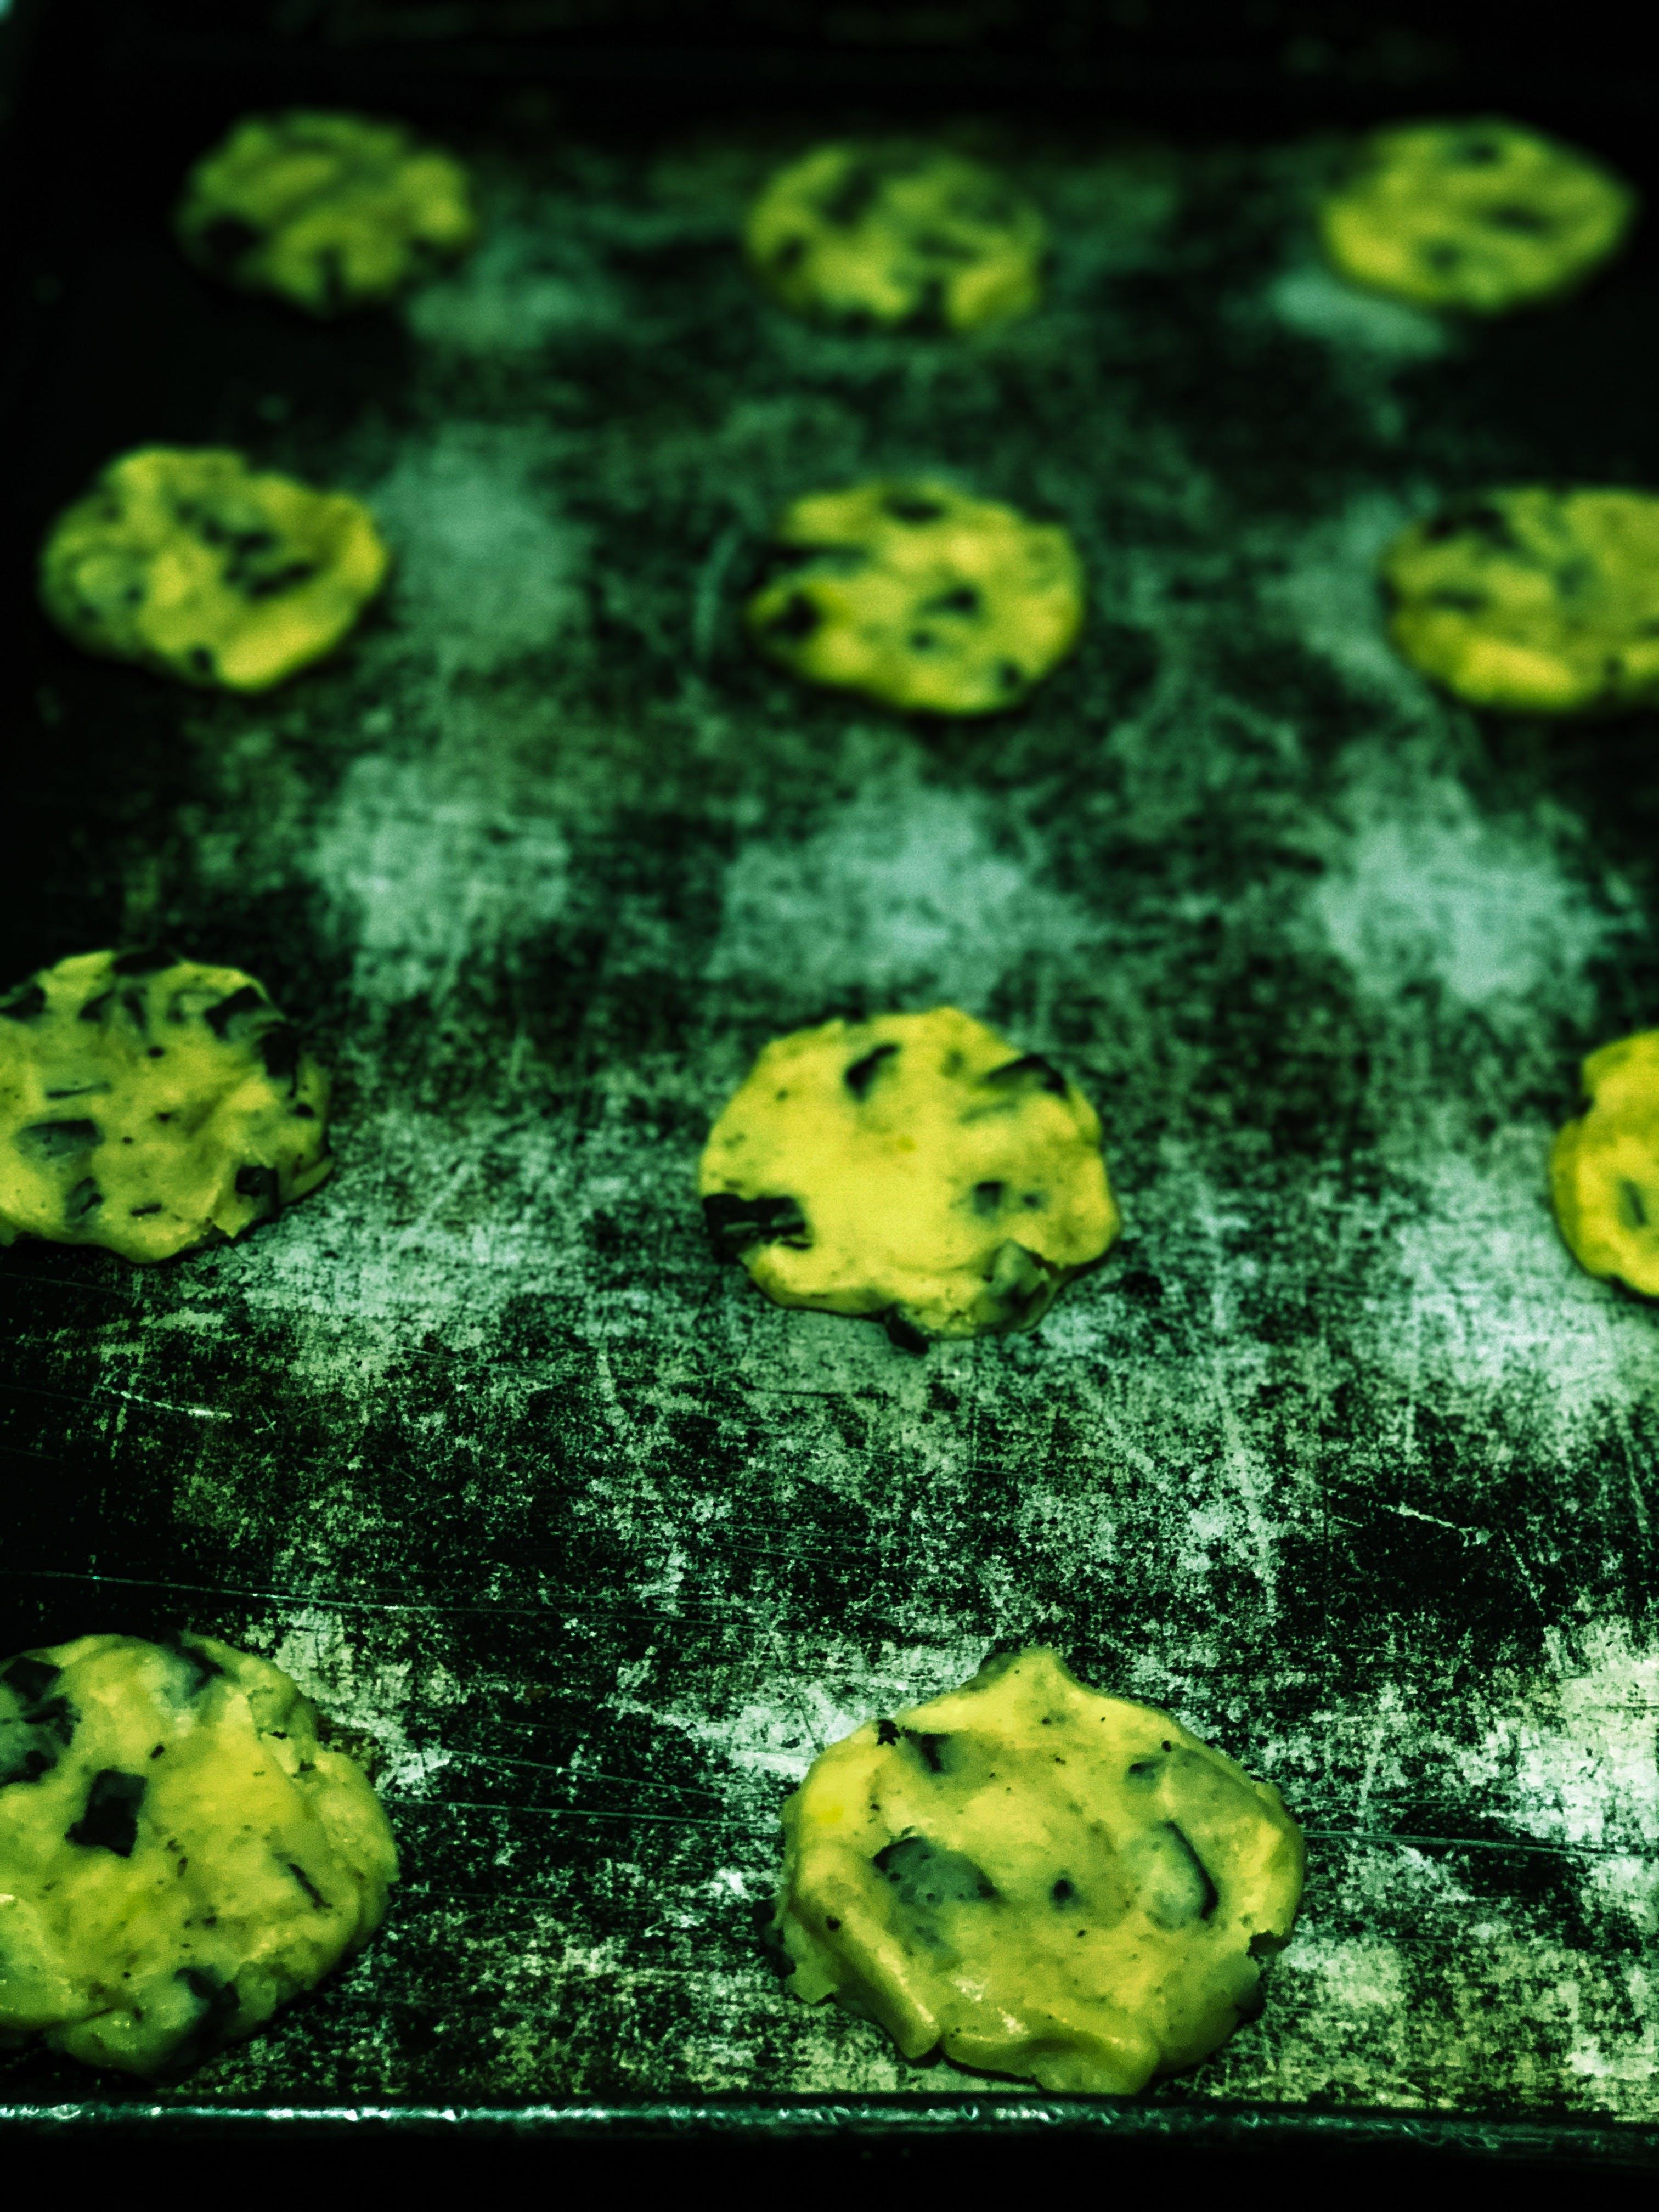 Free stock photo of baking, biscuit, Chocochip, Fresh bake